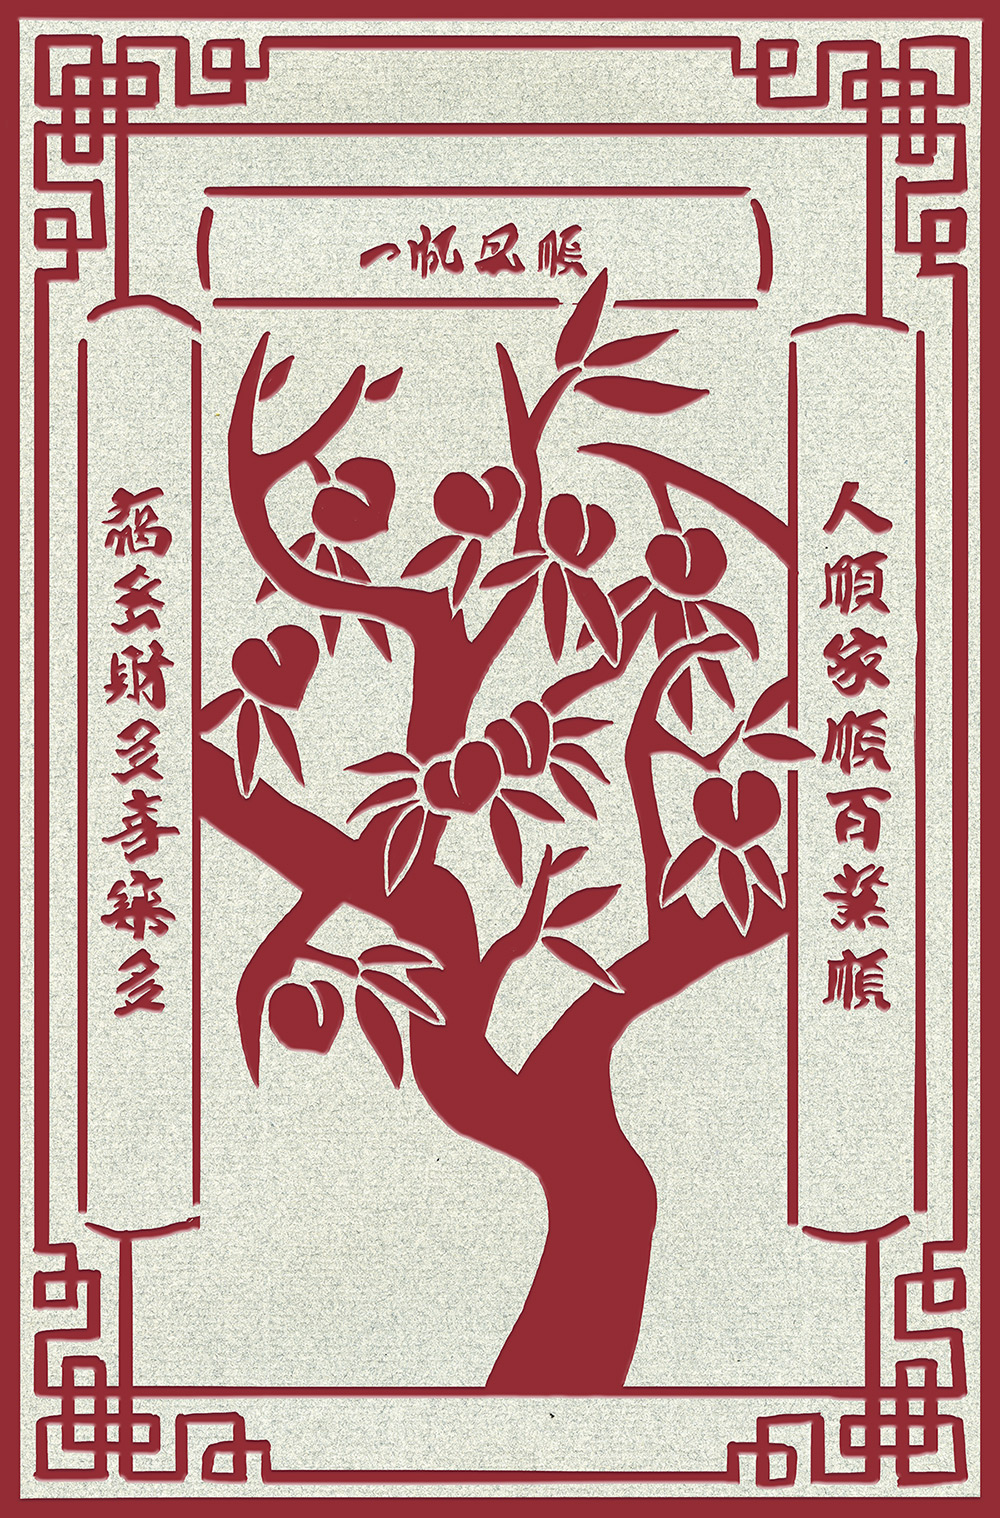 Fiona-Dunnett-Lunar-New-Year-Digital-Papercut-Peach-Tree-Illustration-by-Fiona-Dunnett.jpg